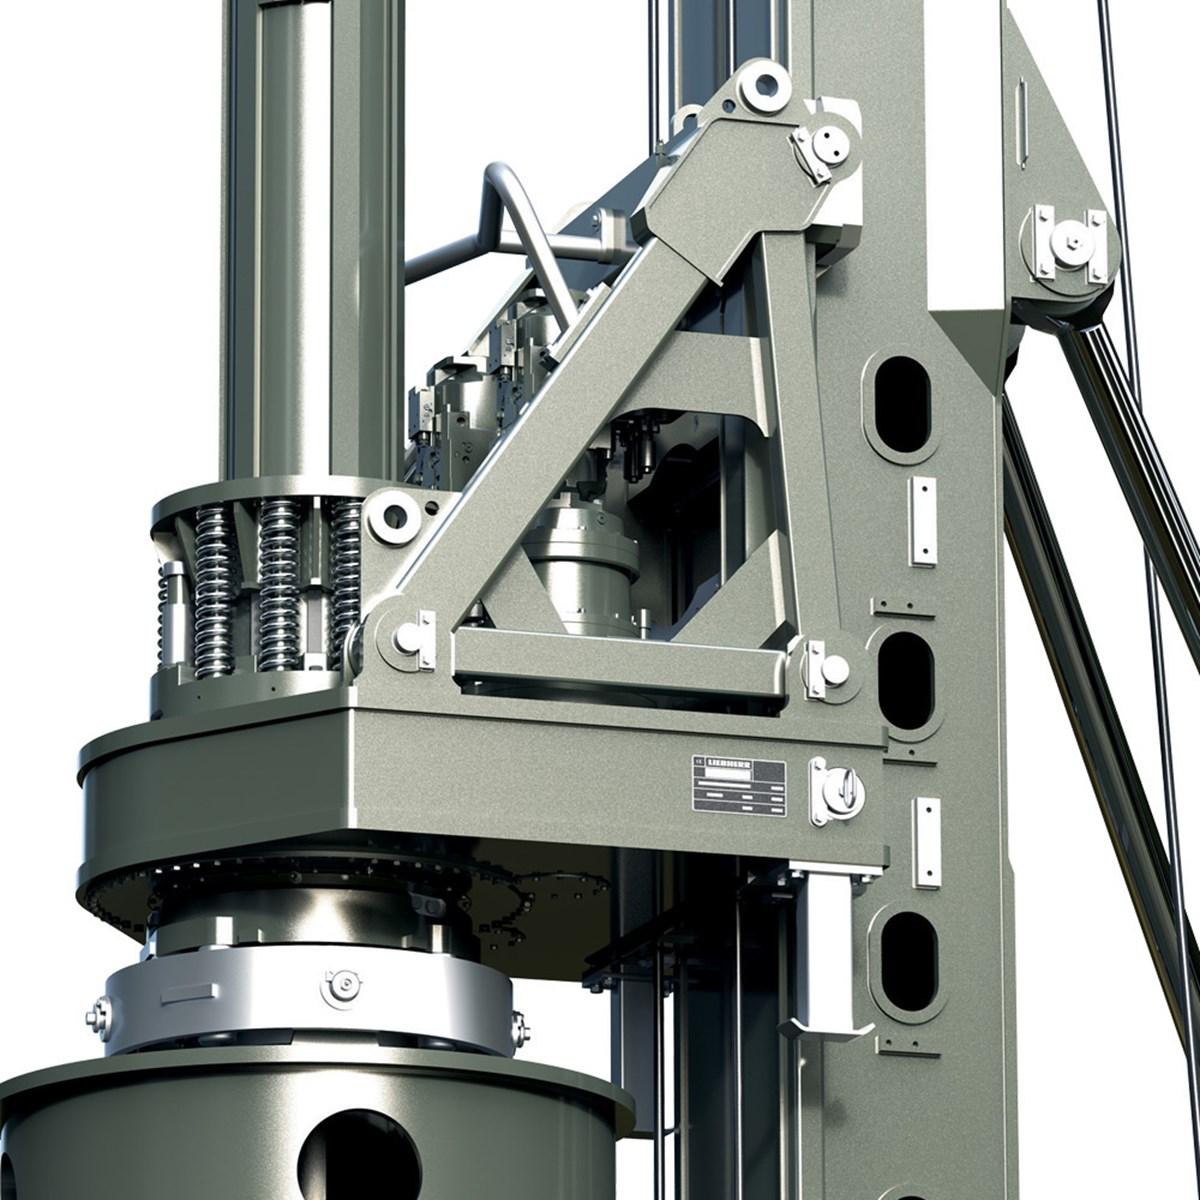 liebherr-bat-serie-rotary-drive-bohrantrieb-drilling-rig-deep-foundation-1-1.jpg